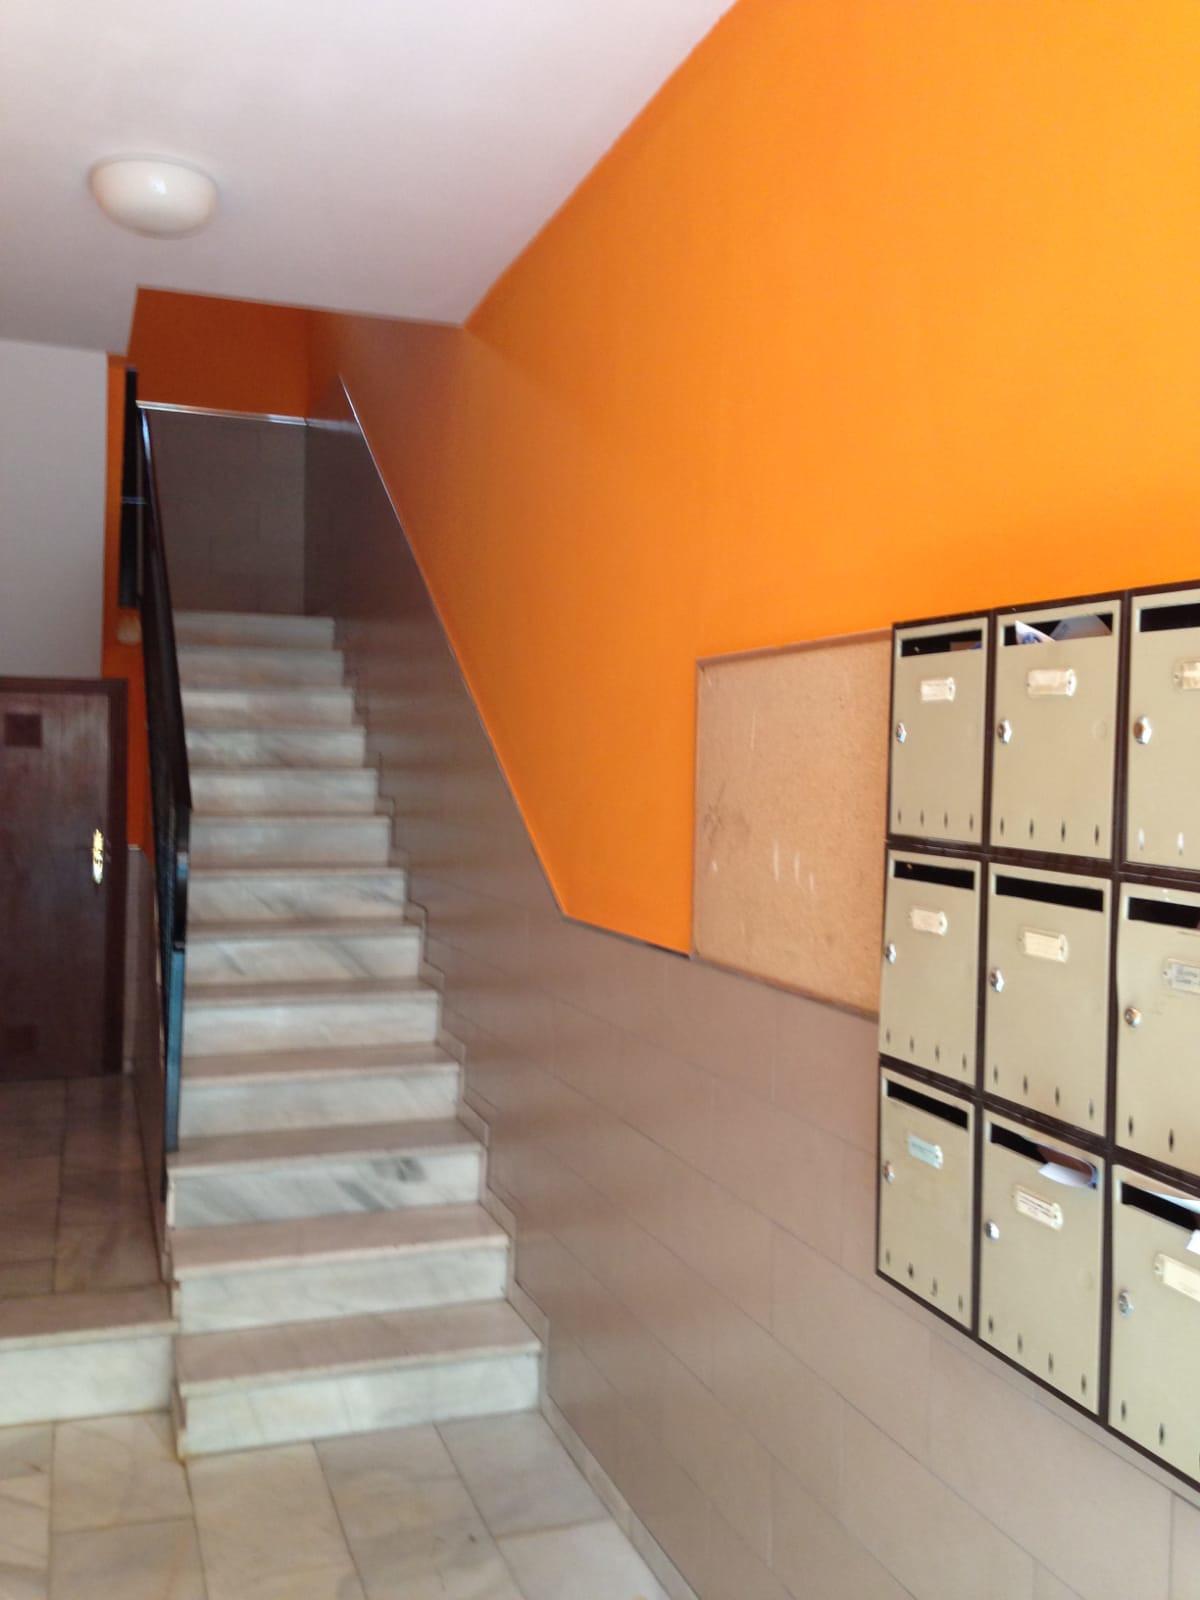 3 Bedroom Apartment for sale Las Lagunas